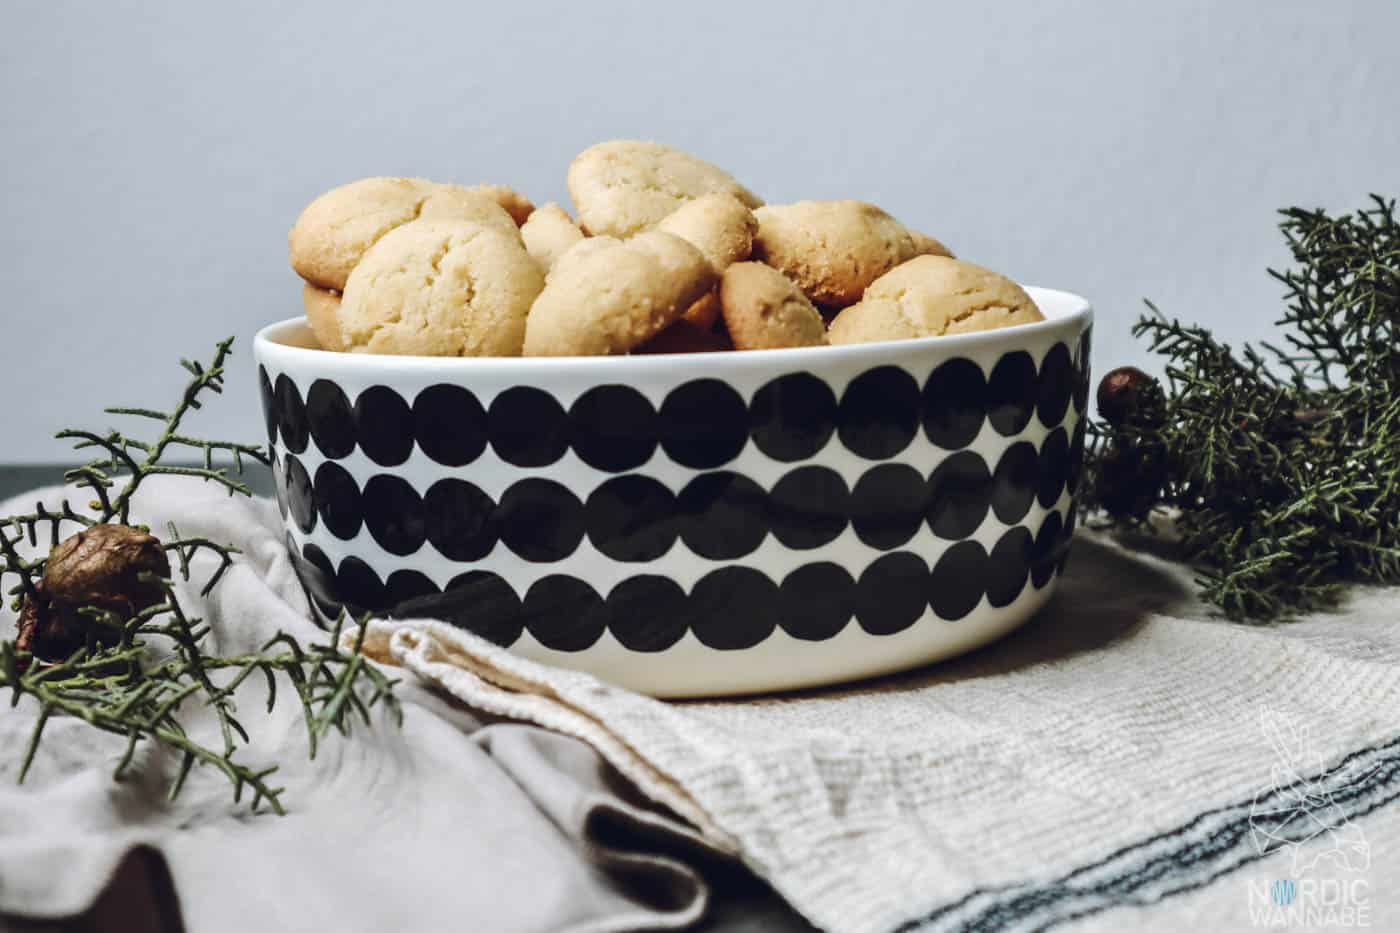 Rezept für skandinavische Kekse